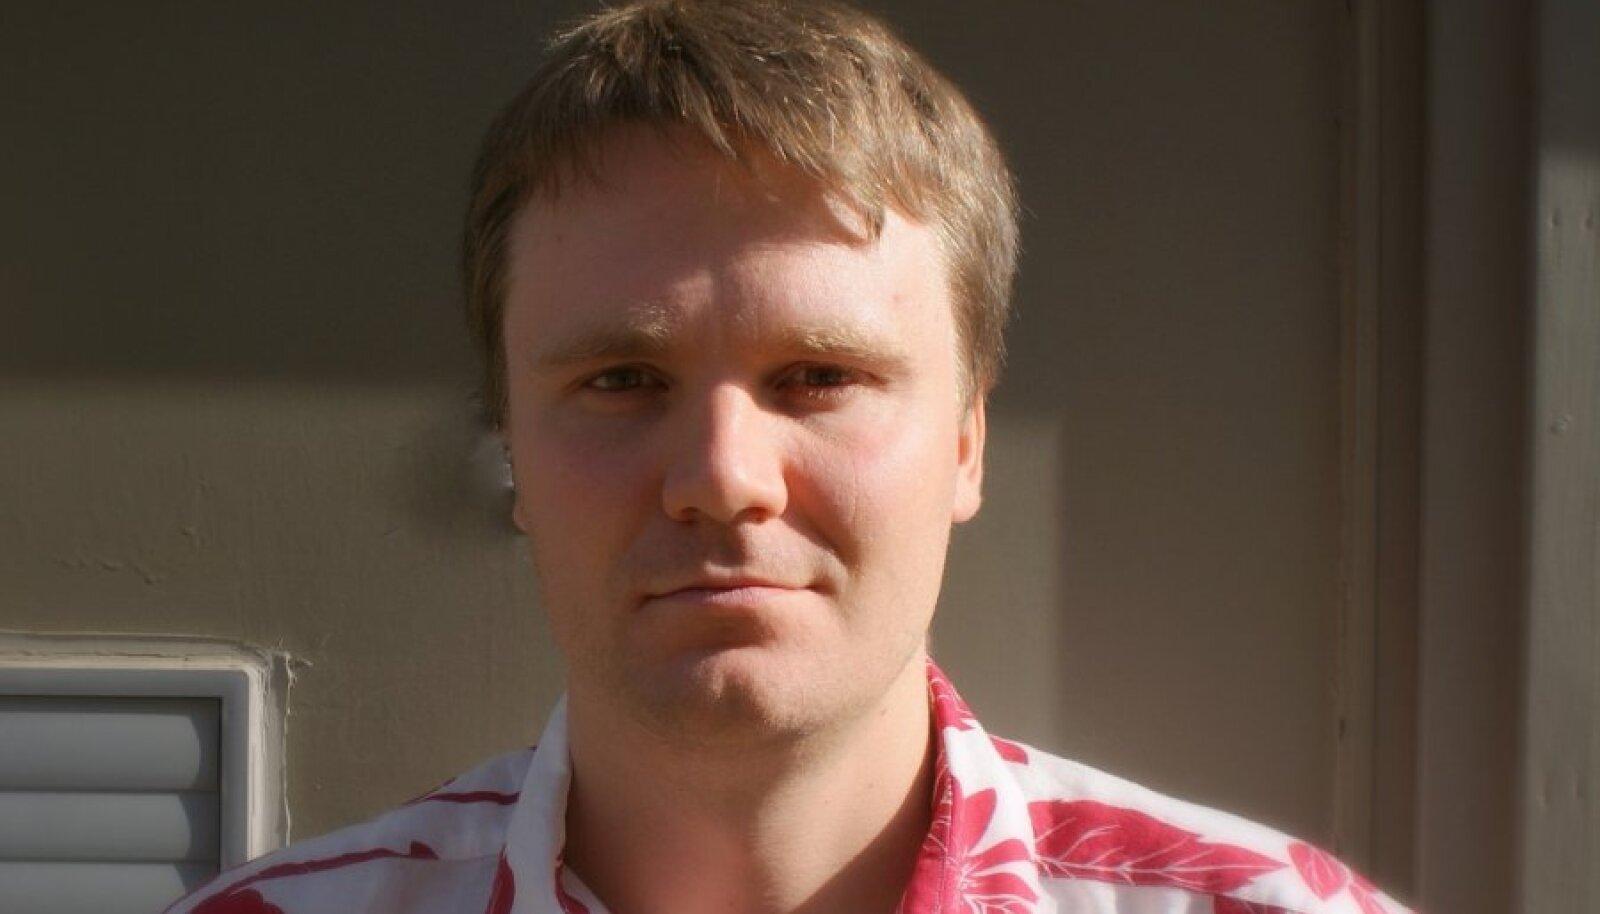 Andrei Lobov